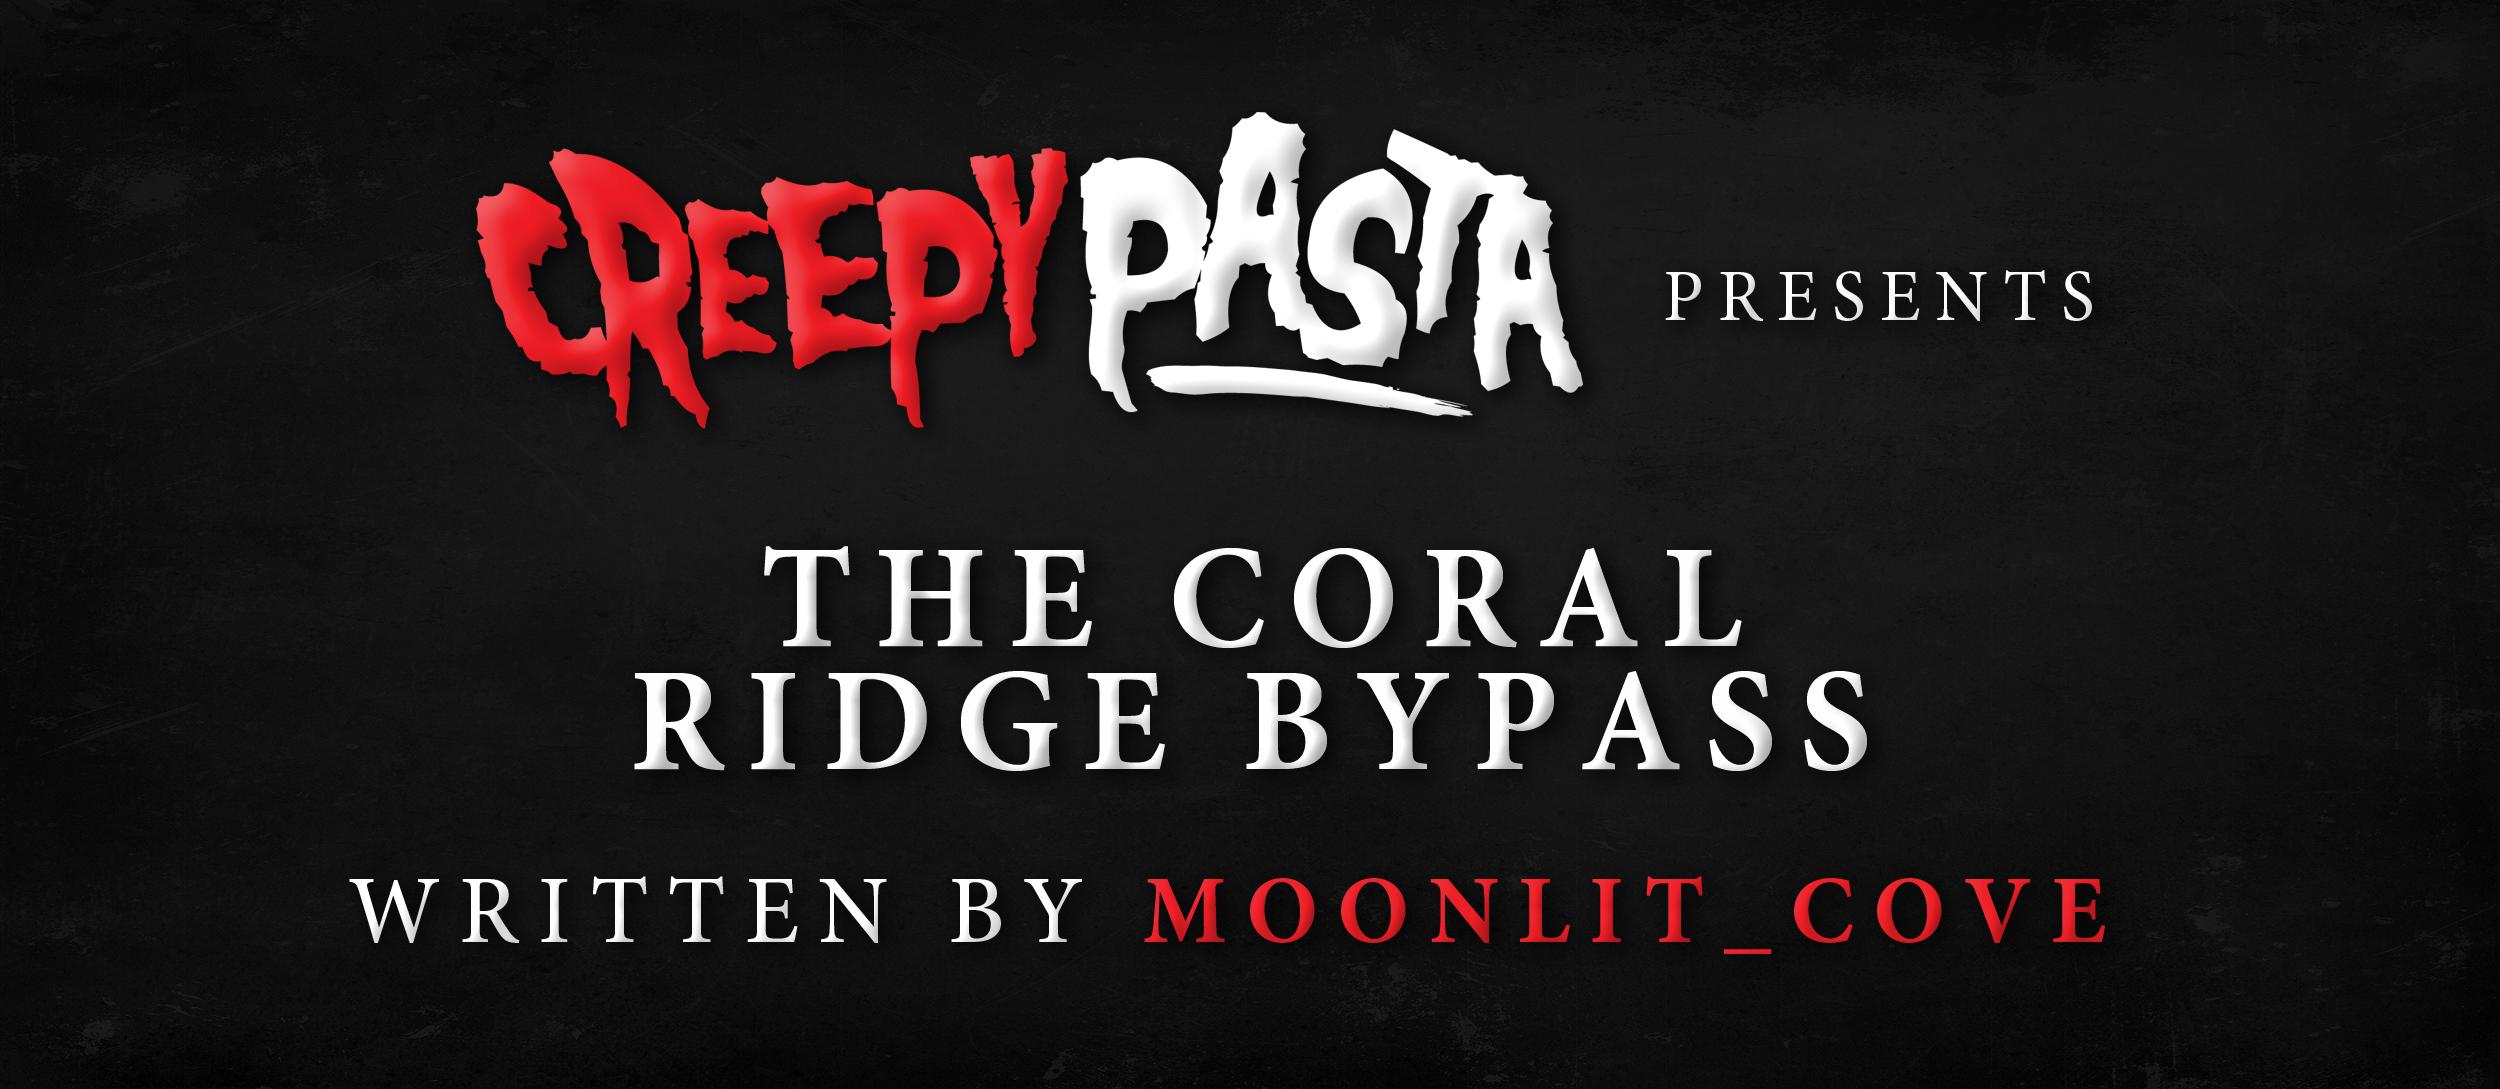 The Coral Ridge Bypass Creepypasta